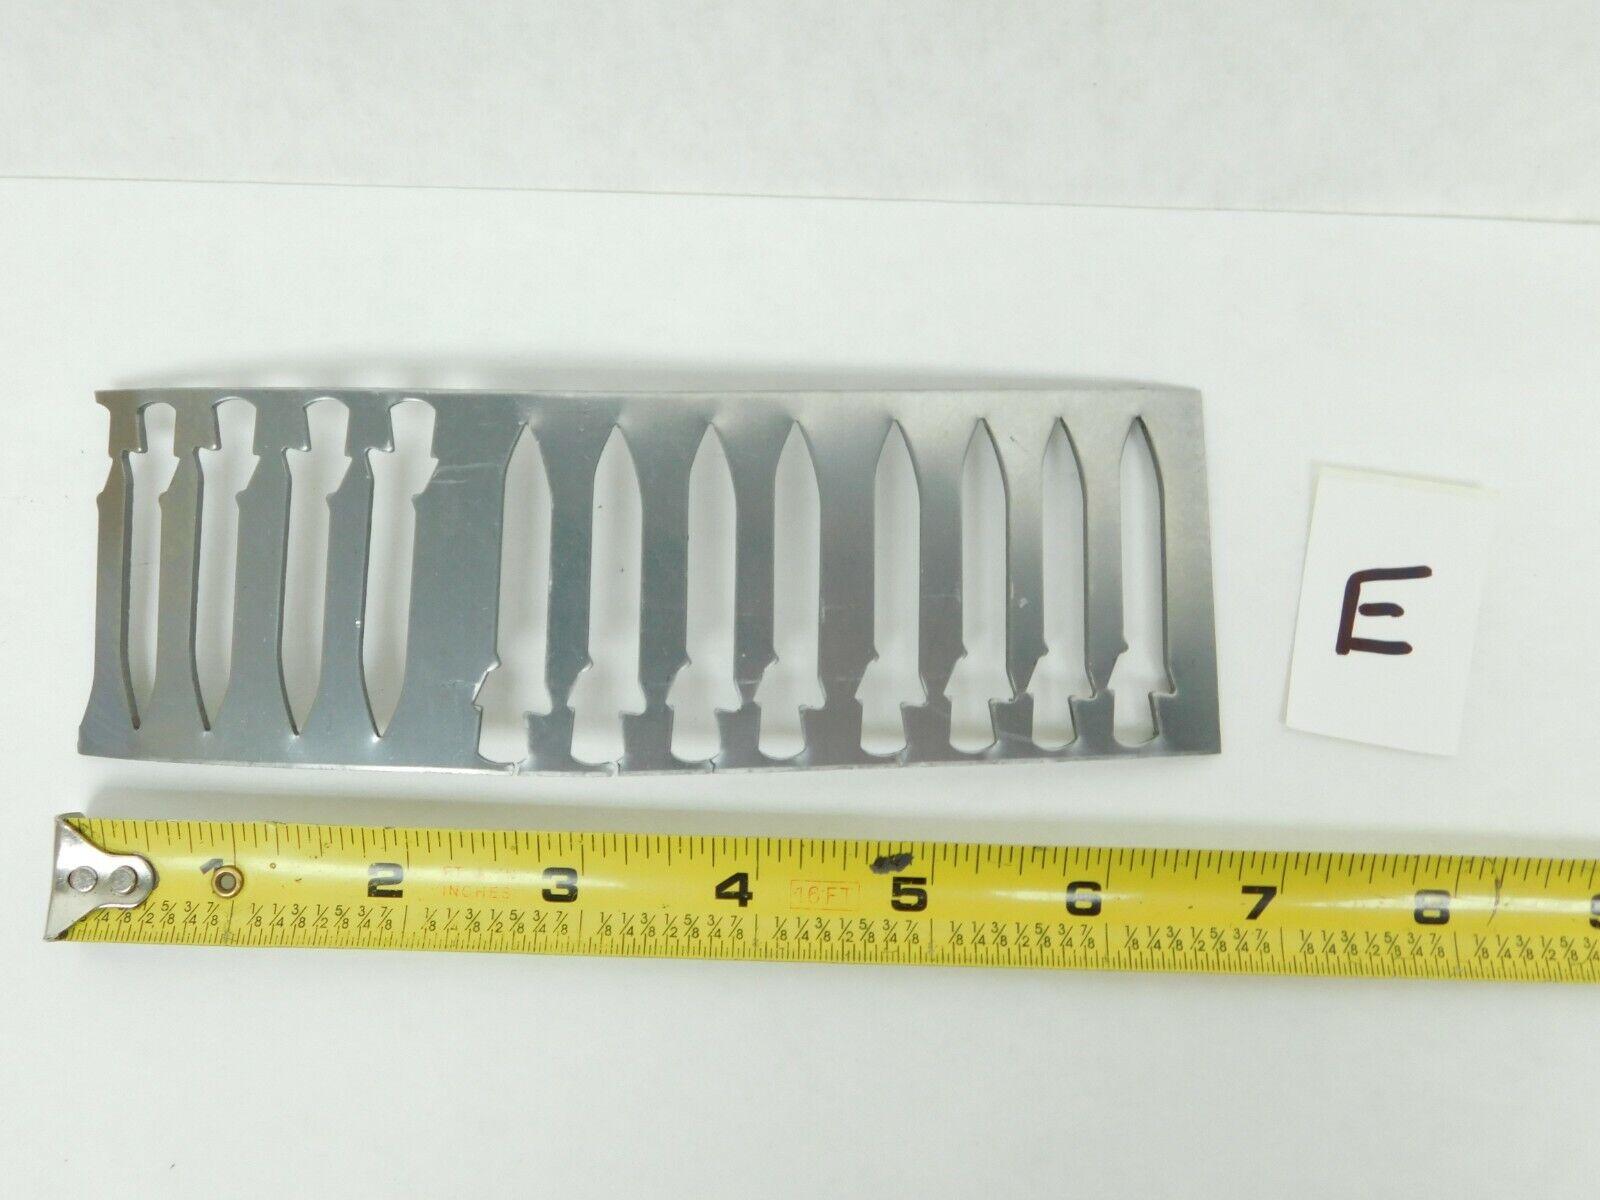 QUEEN CUT. STEEL SHEET POCKET KNIFE BLADE CUTOUT INDUSTRIAL WALL HANG DECOR QC E